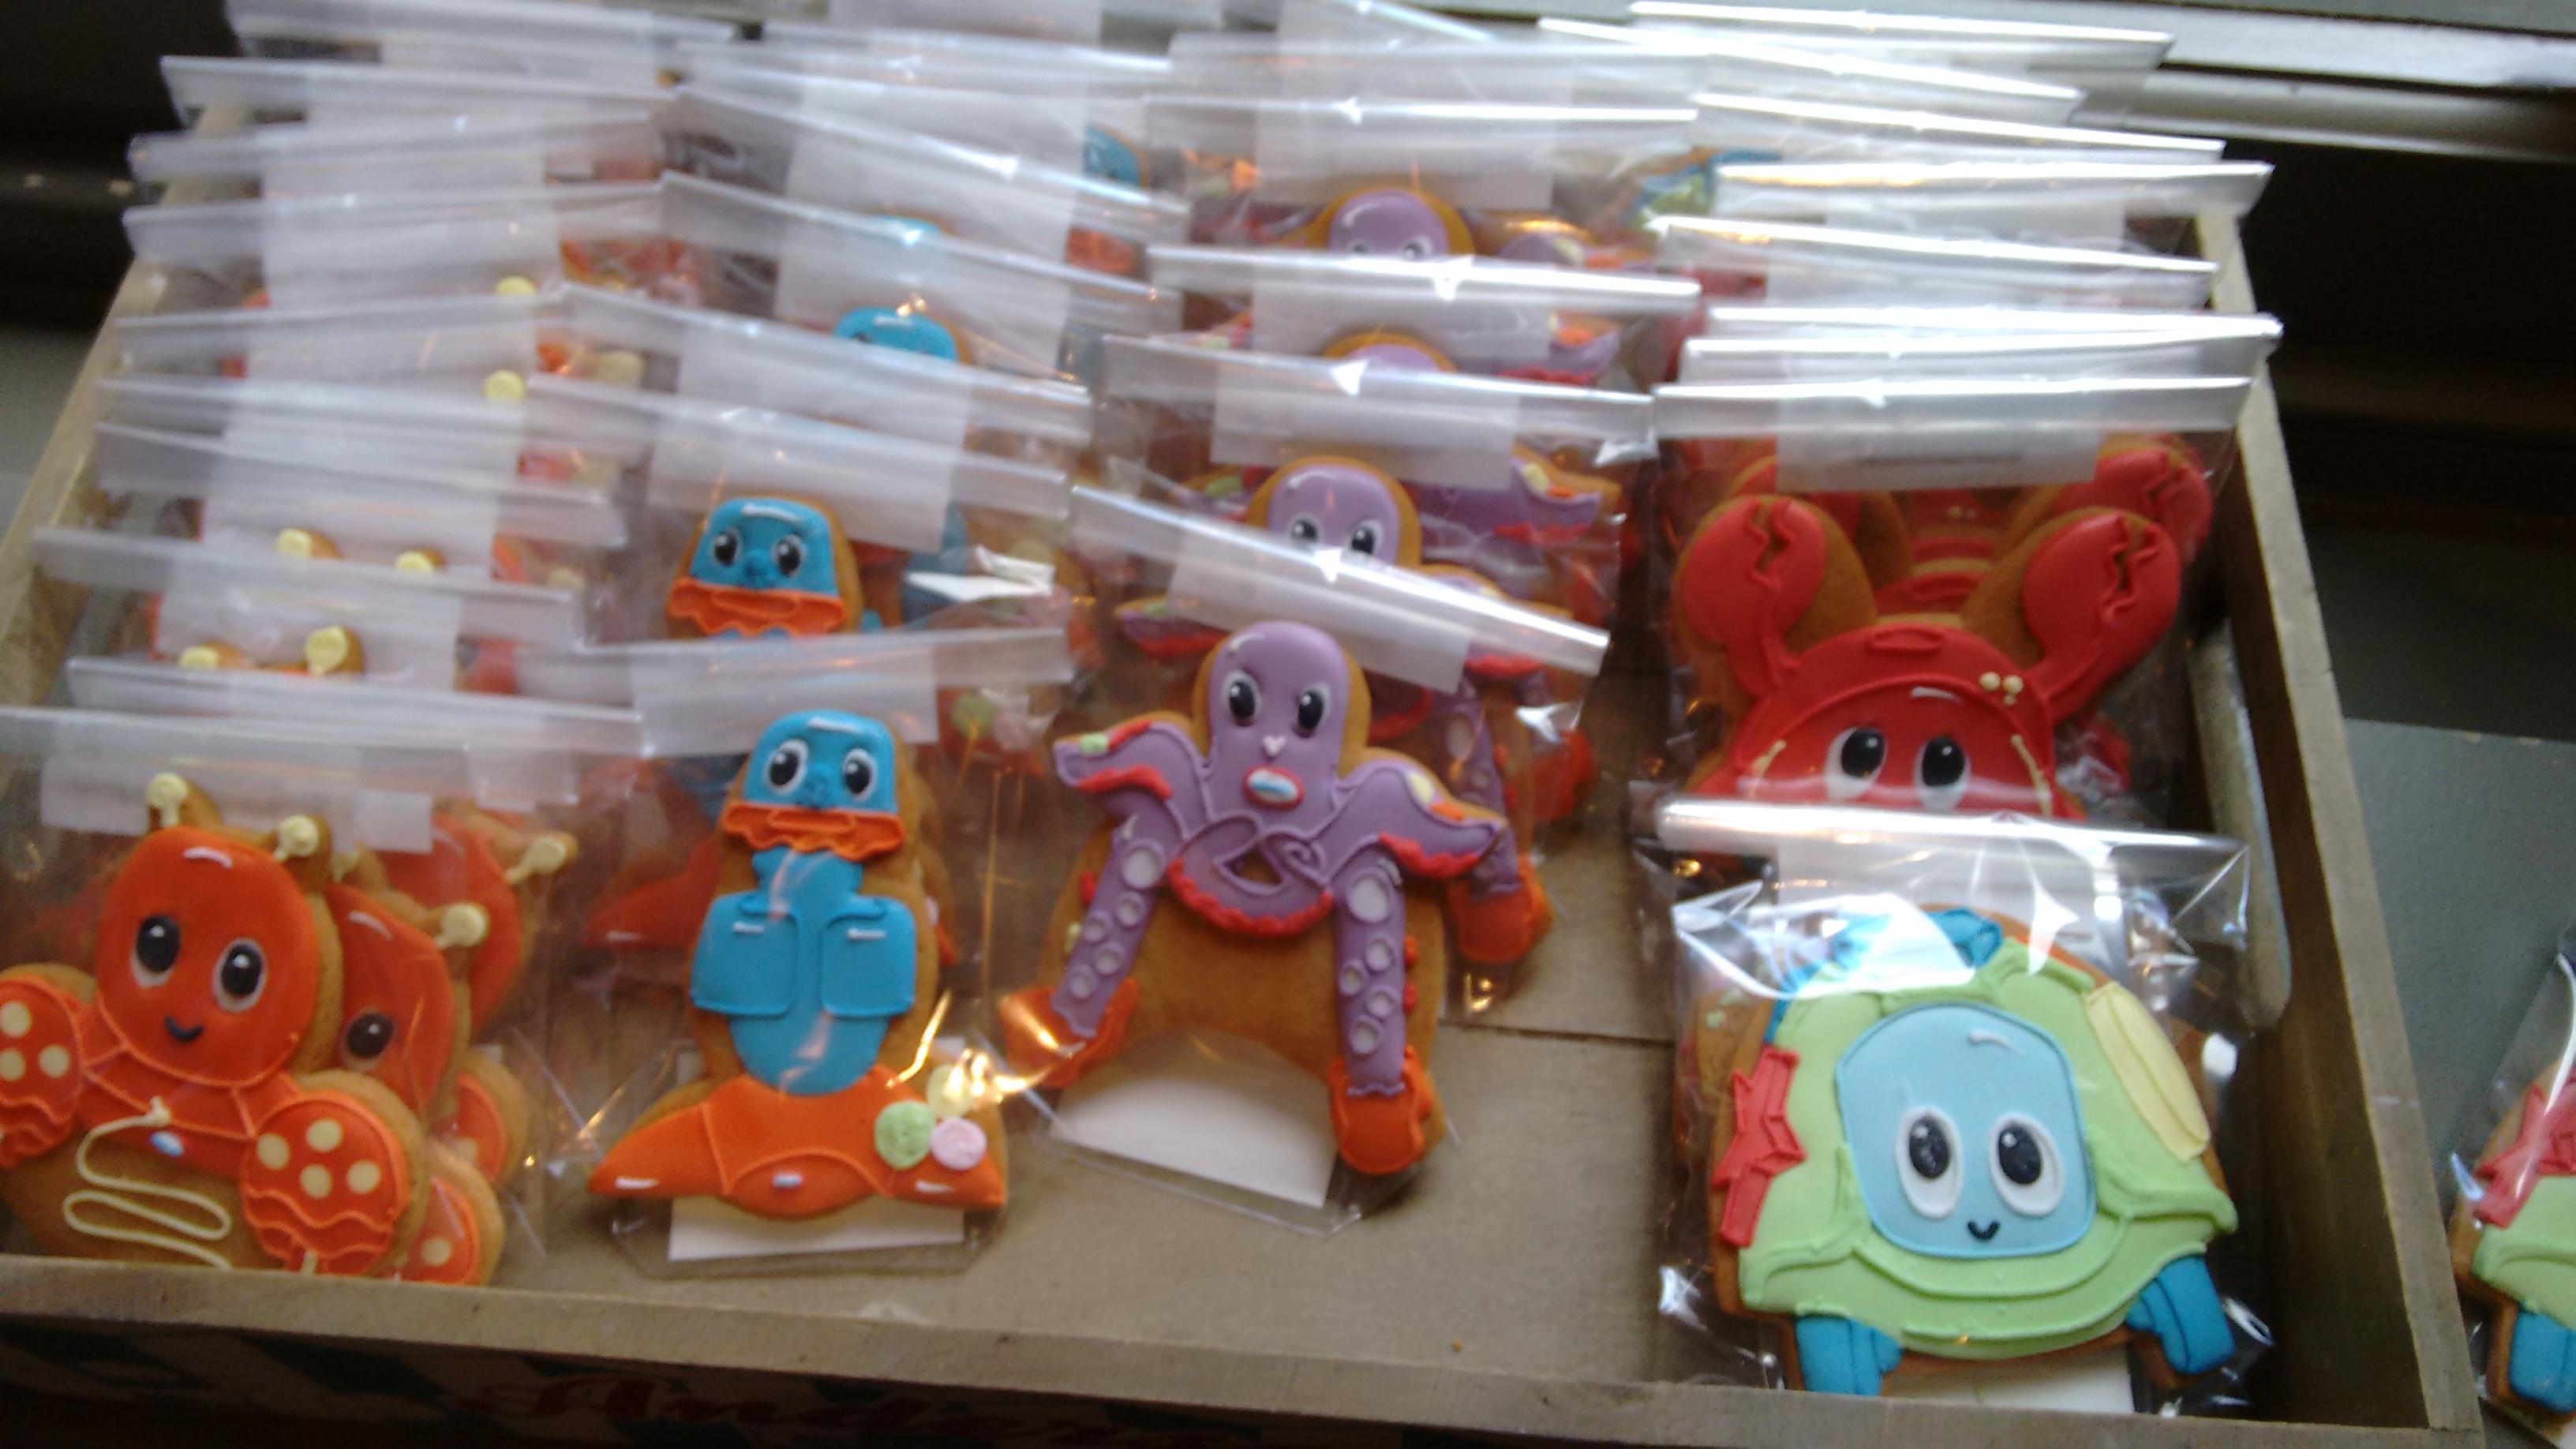 Biscuiteers iced biscuits in Little Tikes Lil' Ocean Explorers range!